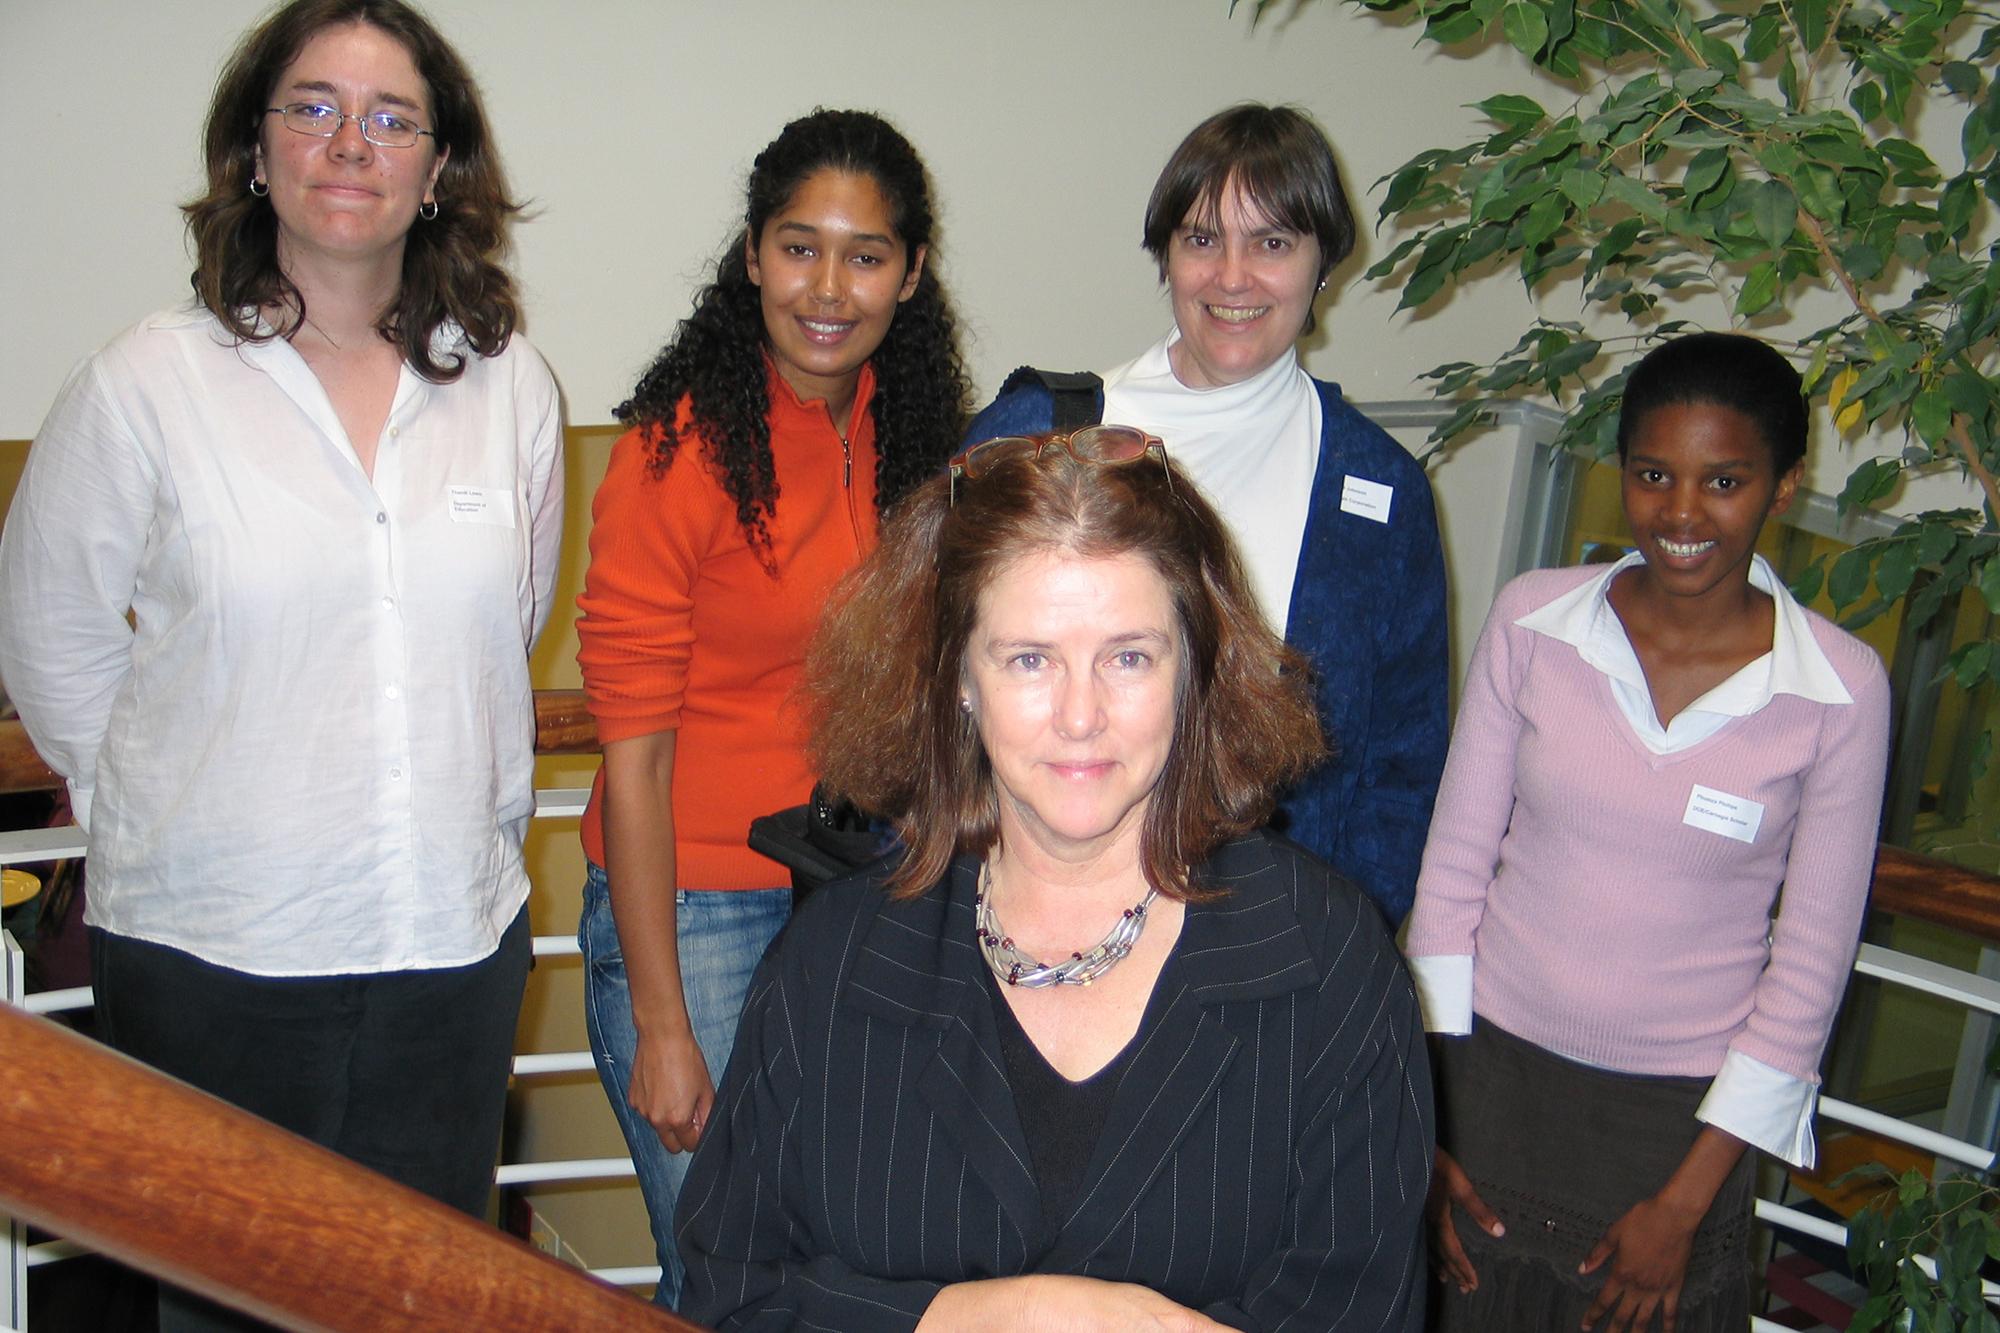 Scholarships For Women >> Carnegie Scholarships For Women In Science Uct News